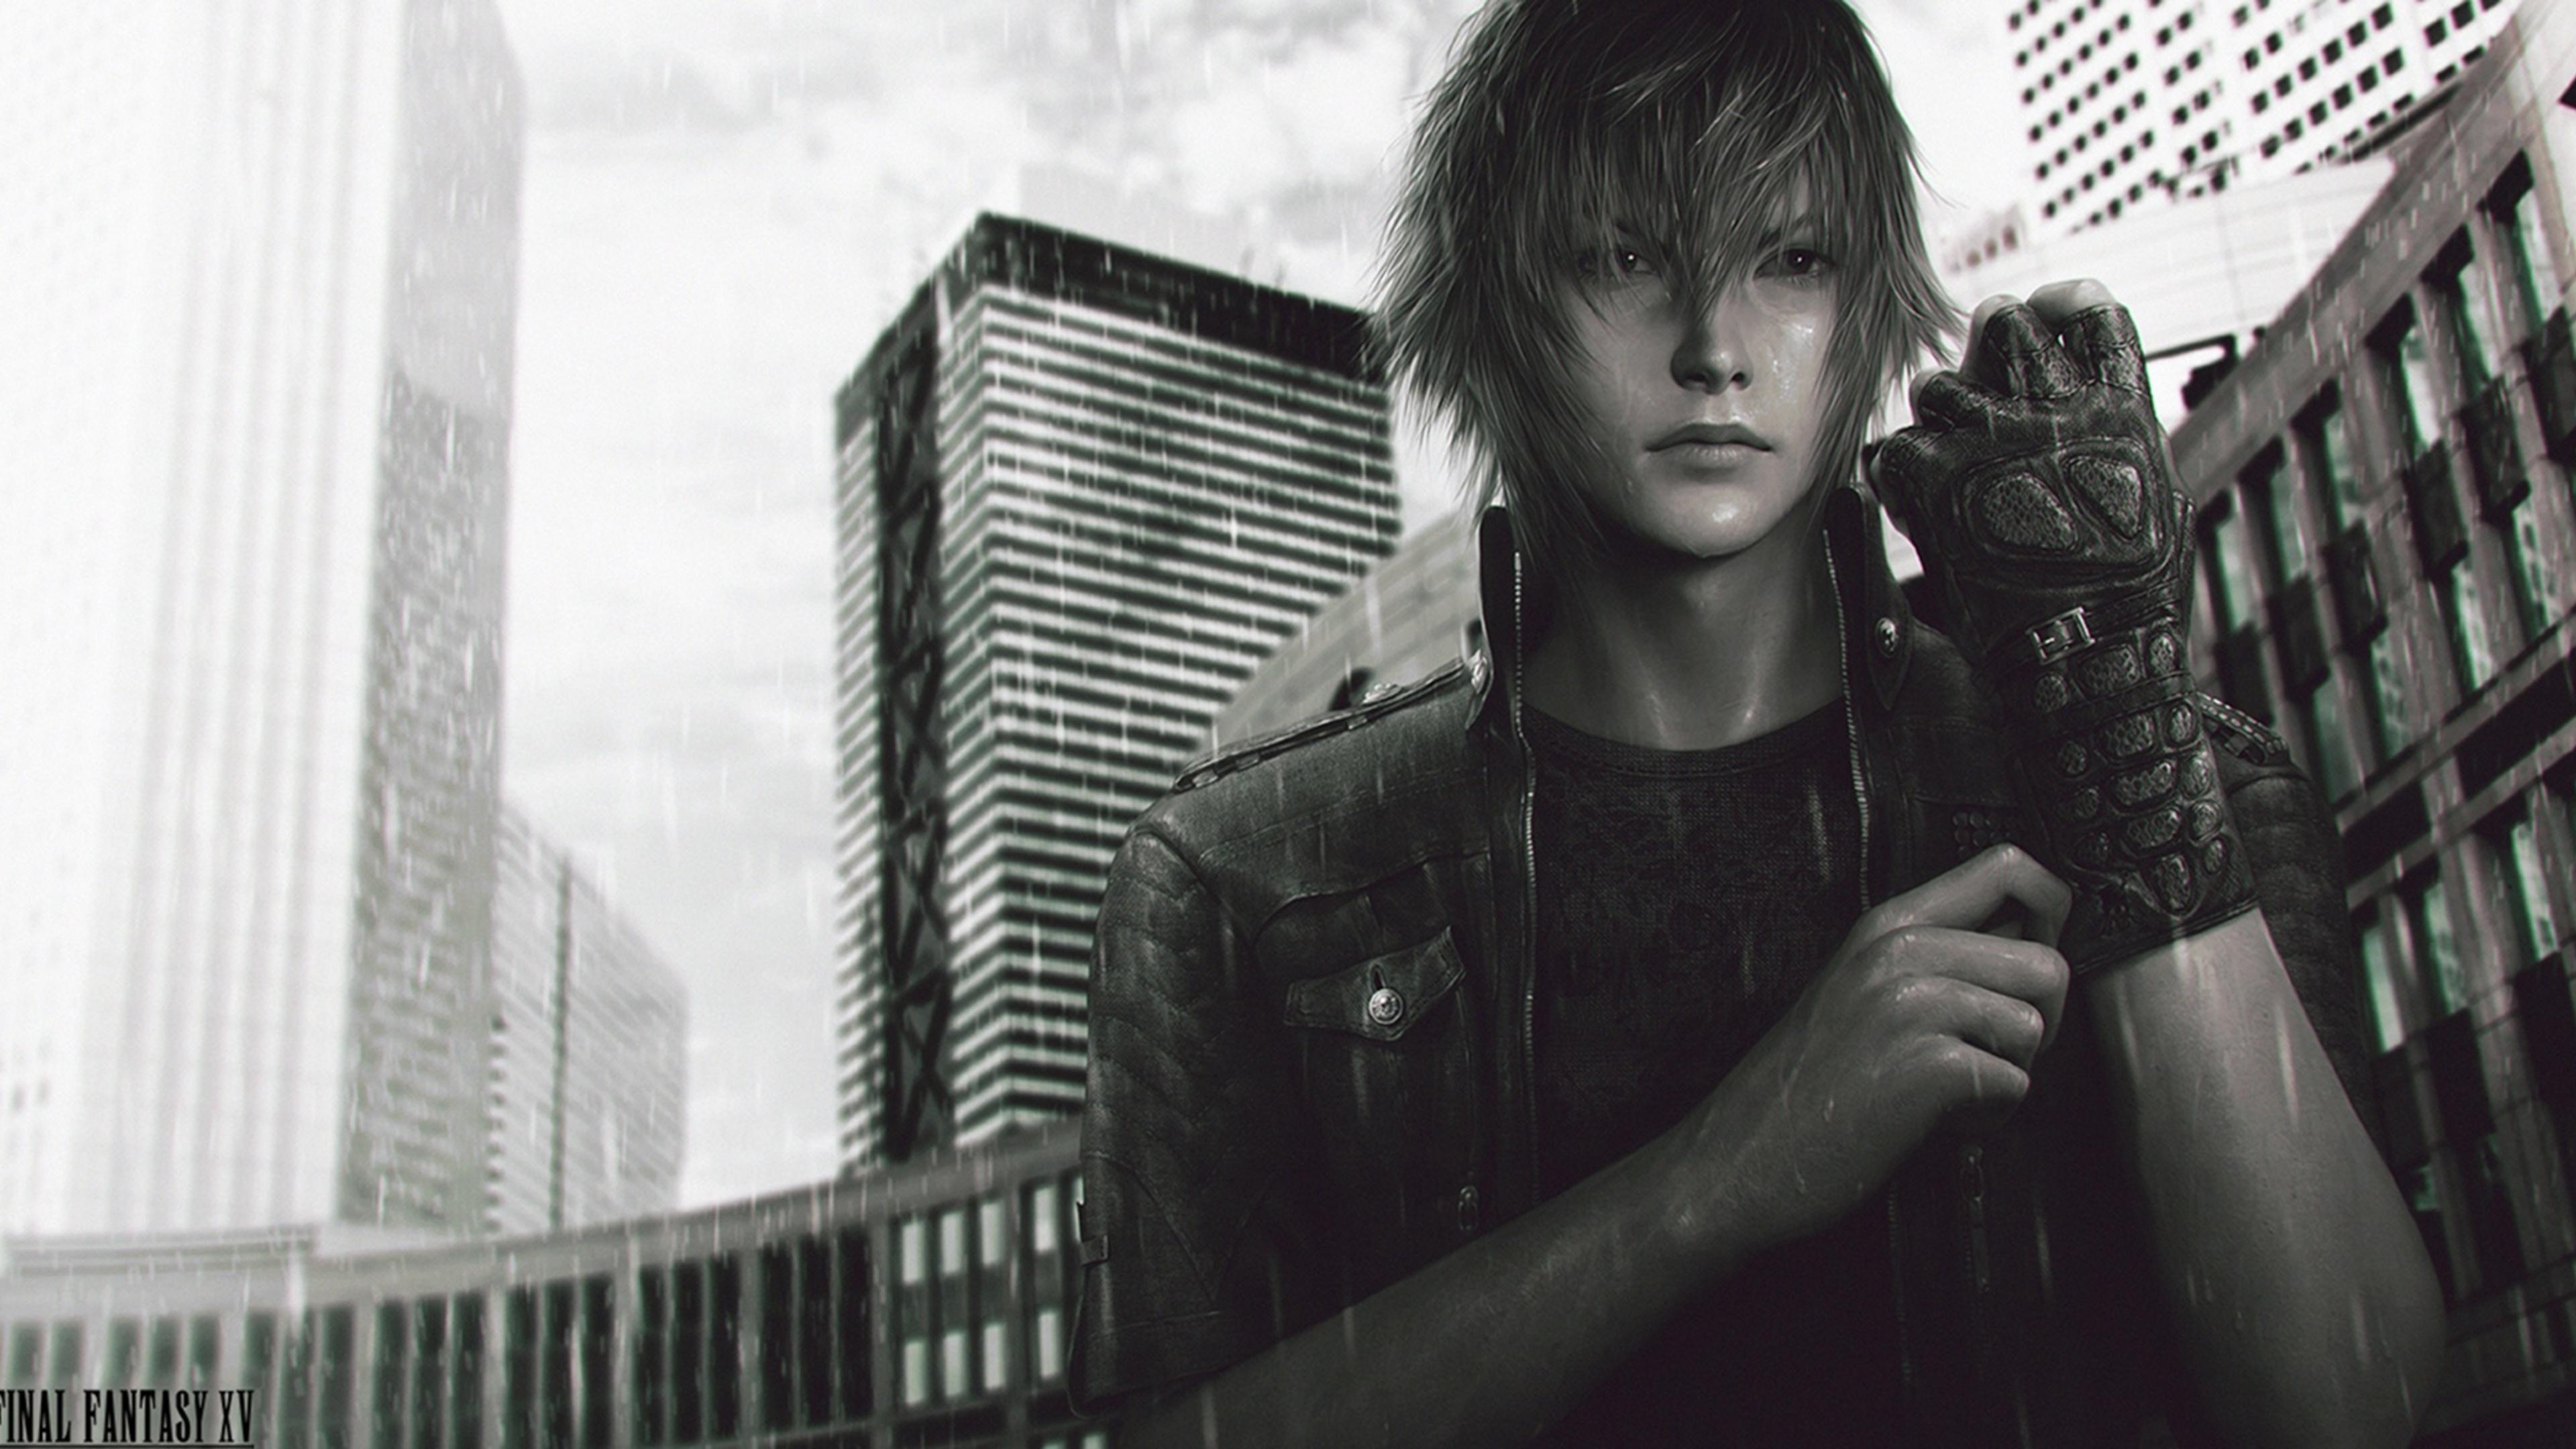 Noctis Lucis Caelum Final Fantasy Xv Artwork Hd Games 4k: 3840x2160 Noctis Lucis Caelum Final Fantasy XV 4k HD 4k